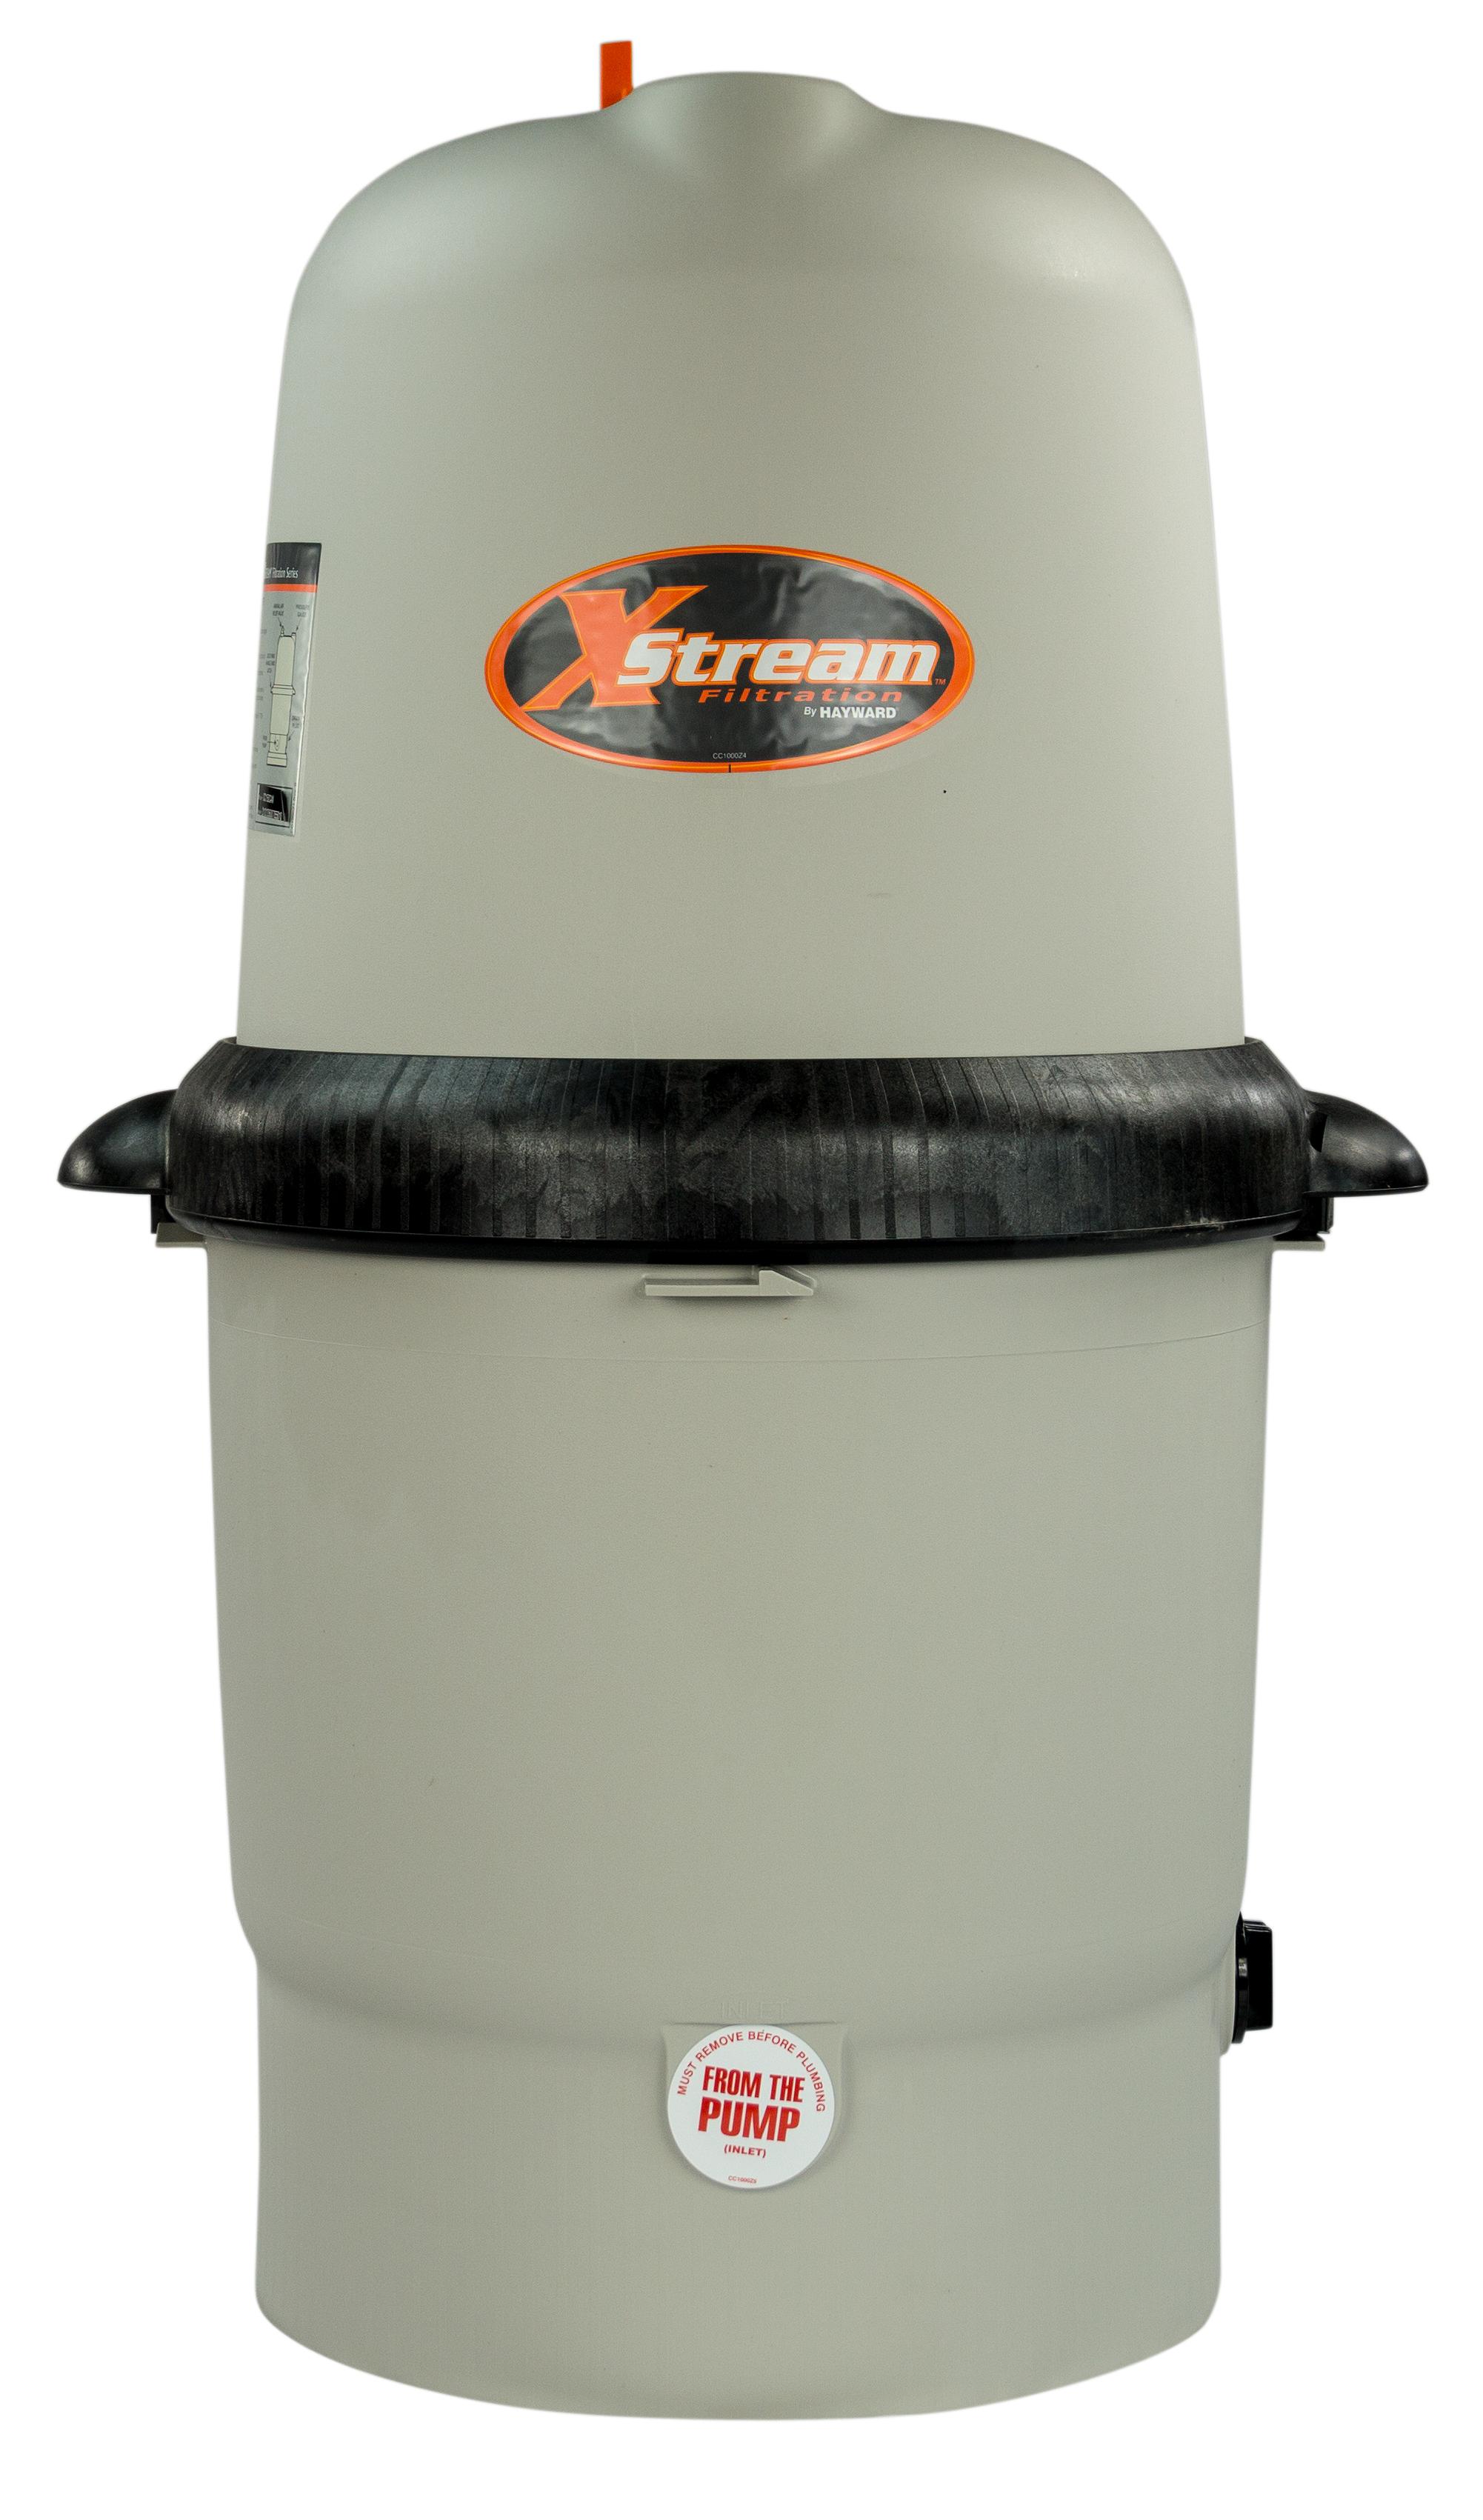 Hayward 174 Xstream 100 Sq Ft Cartridge Filter